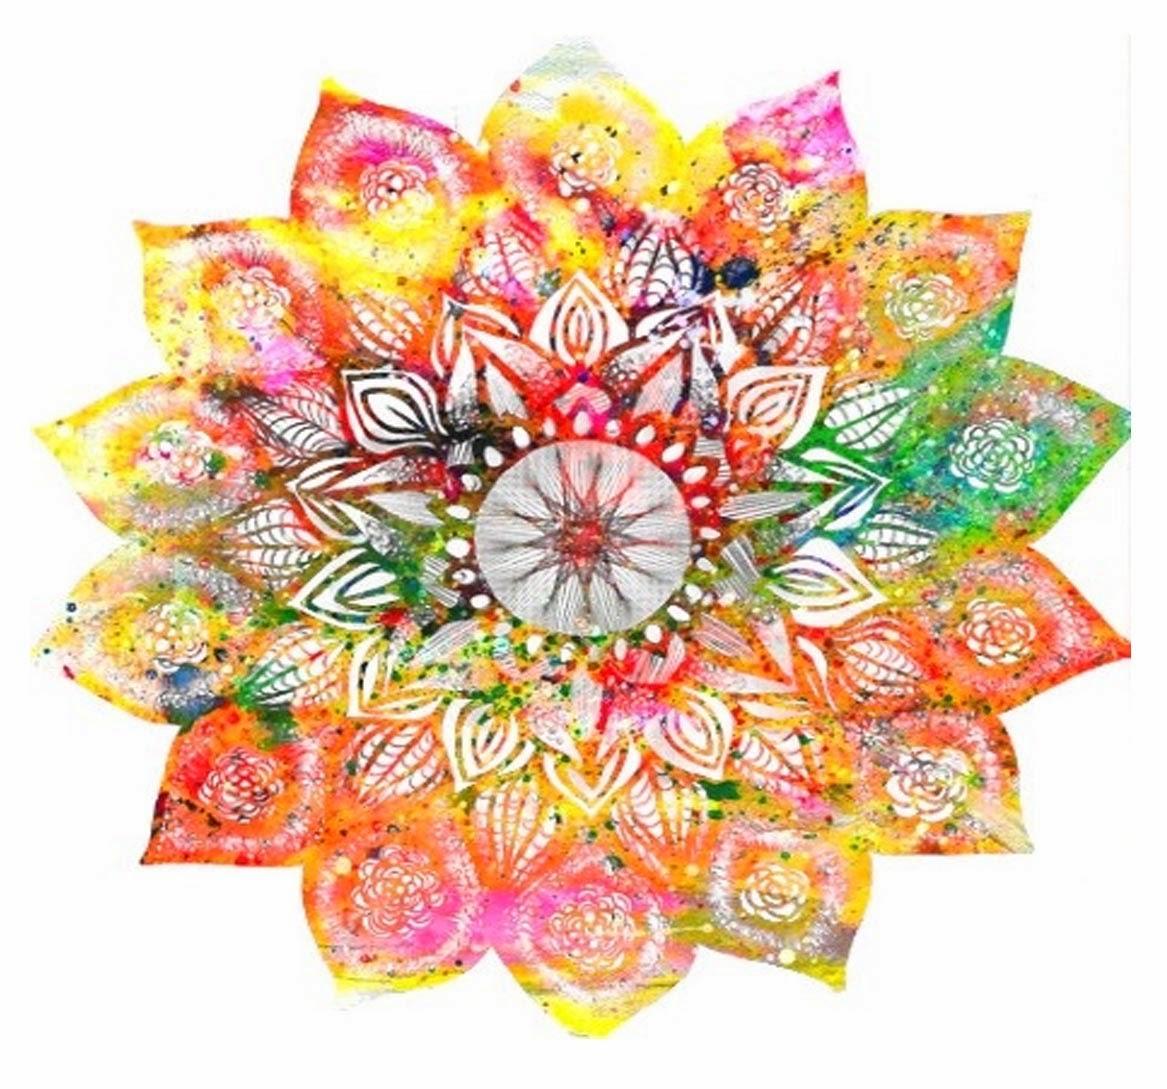 Meditate Art and Create